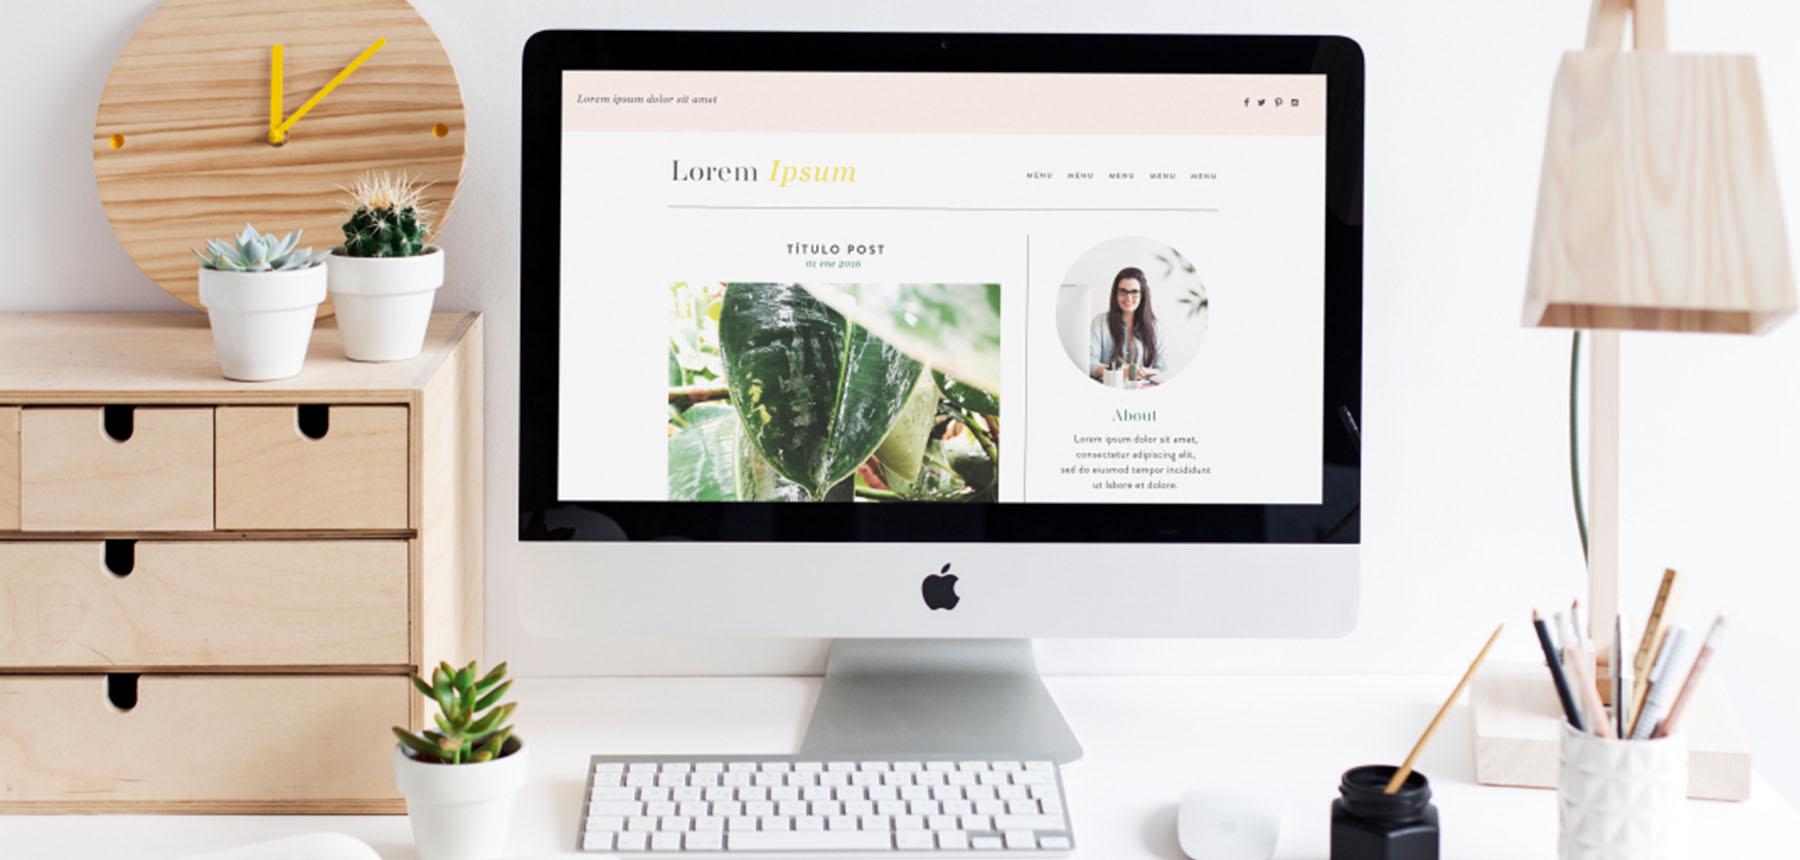 25d115806d Diseña tu blog - Hello! Creatividad